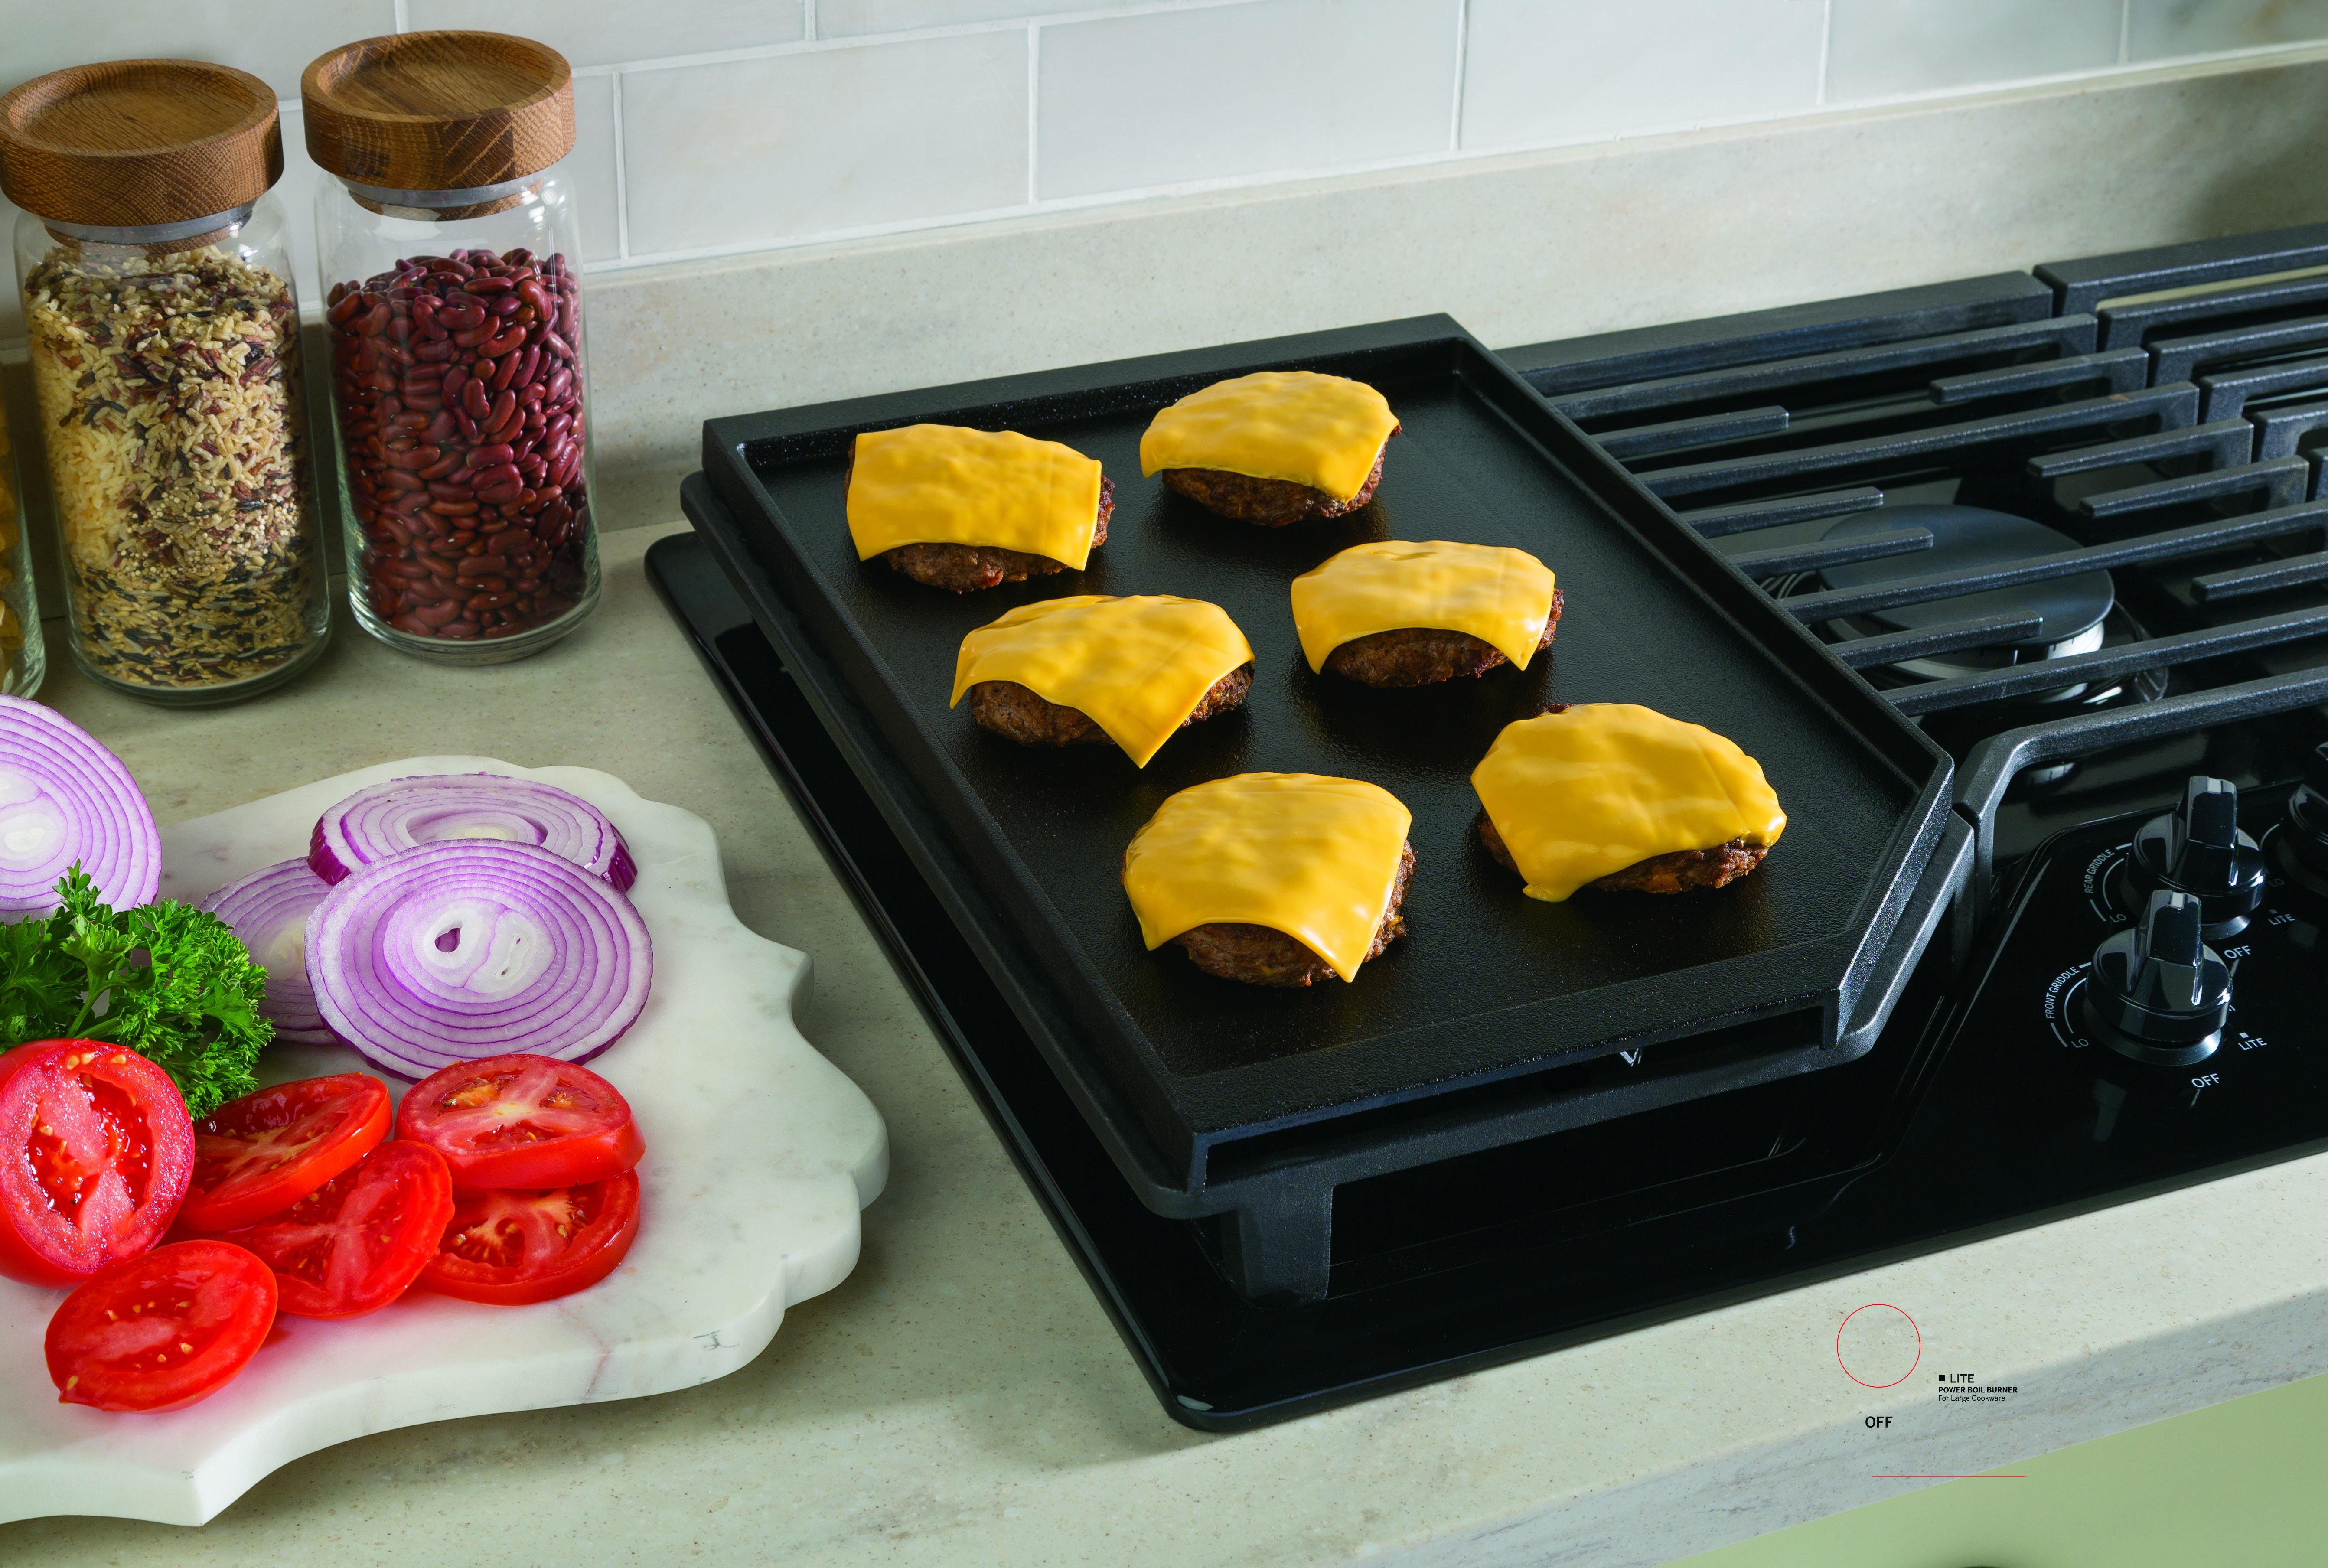 "Model: JGP5036DLBB | GE GE® 36"" Built-In Gas Cooktop with 5 Burners and Dishwasher Safe Grates"